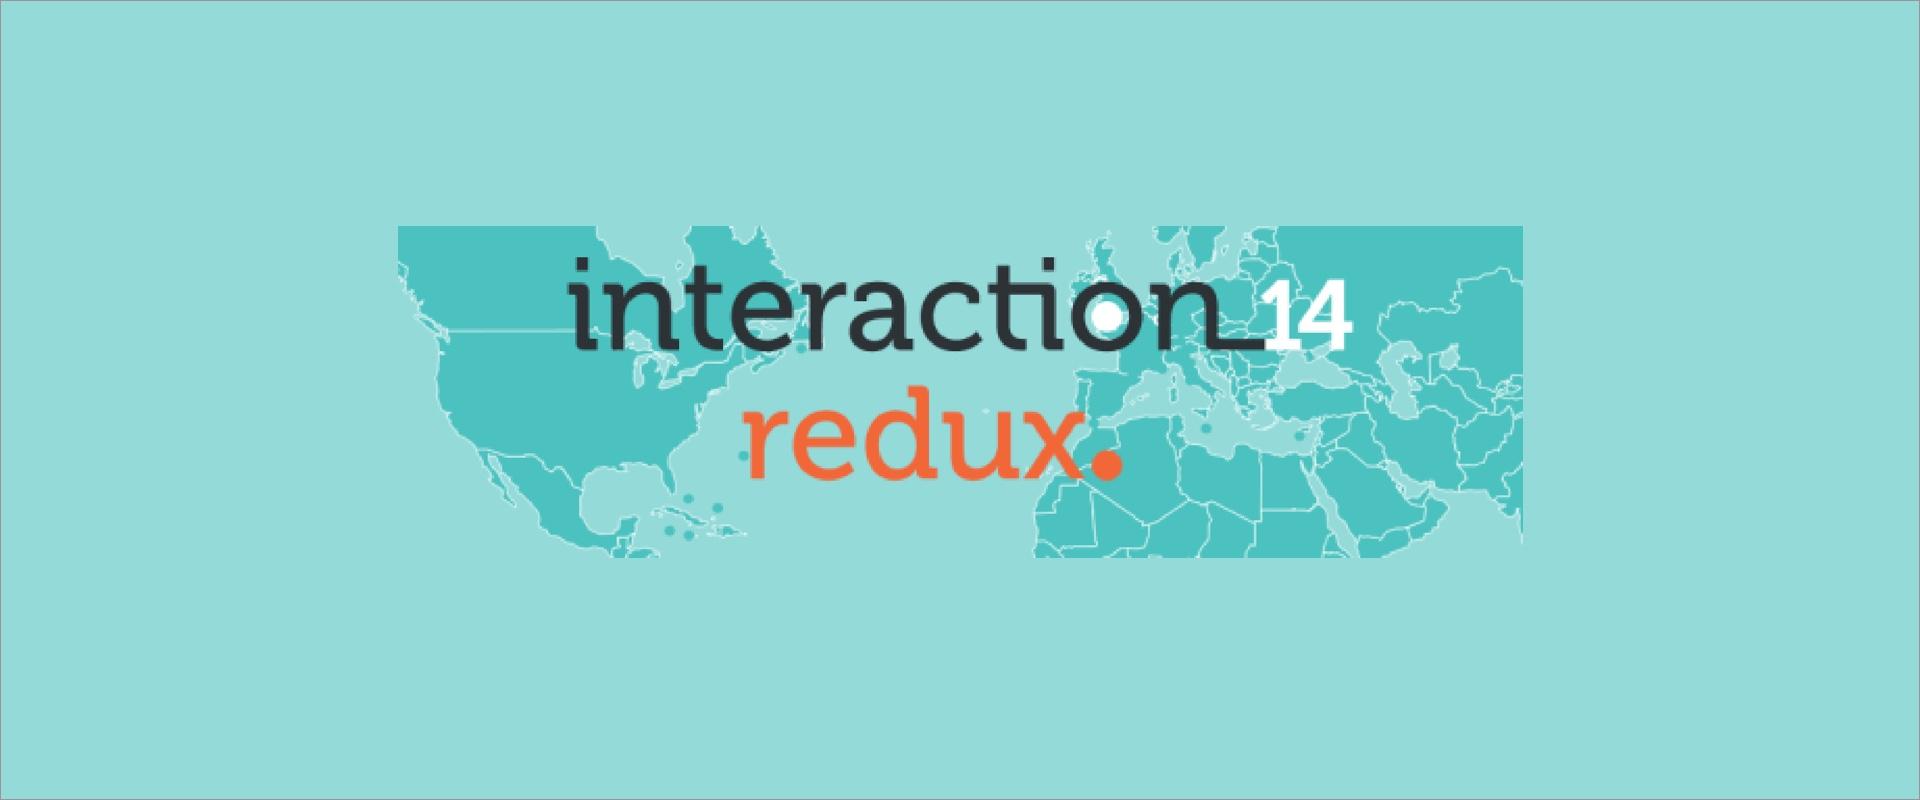 Interaction14